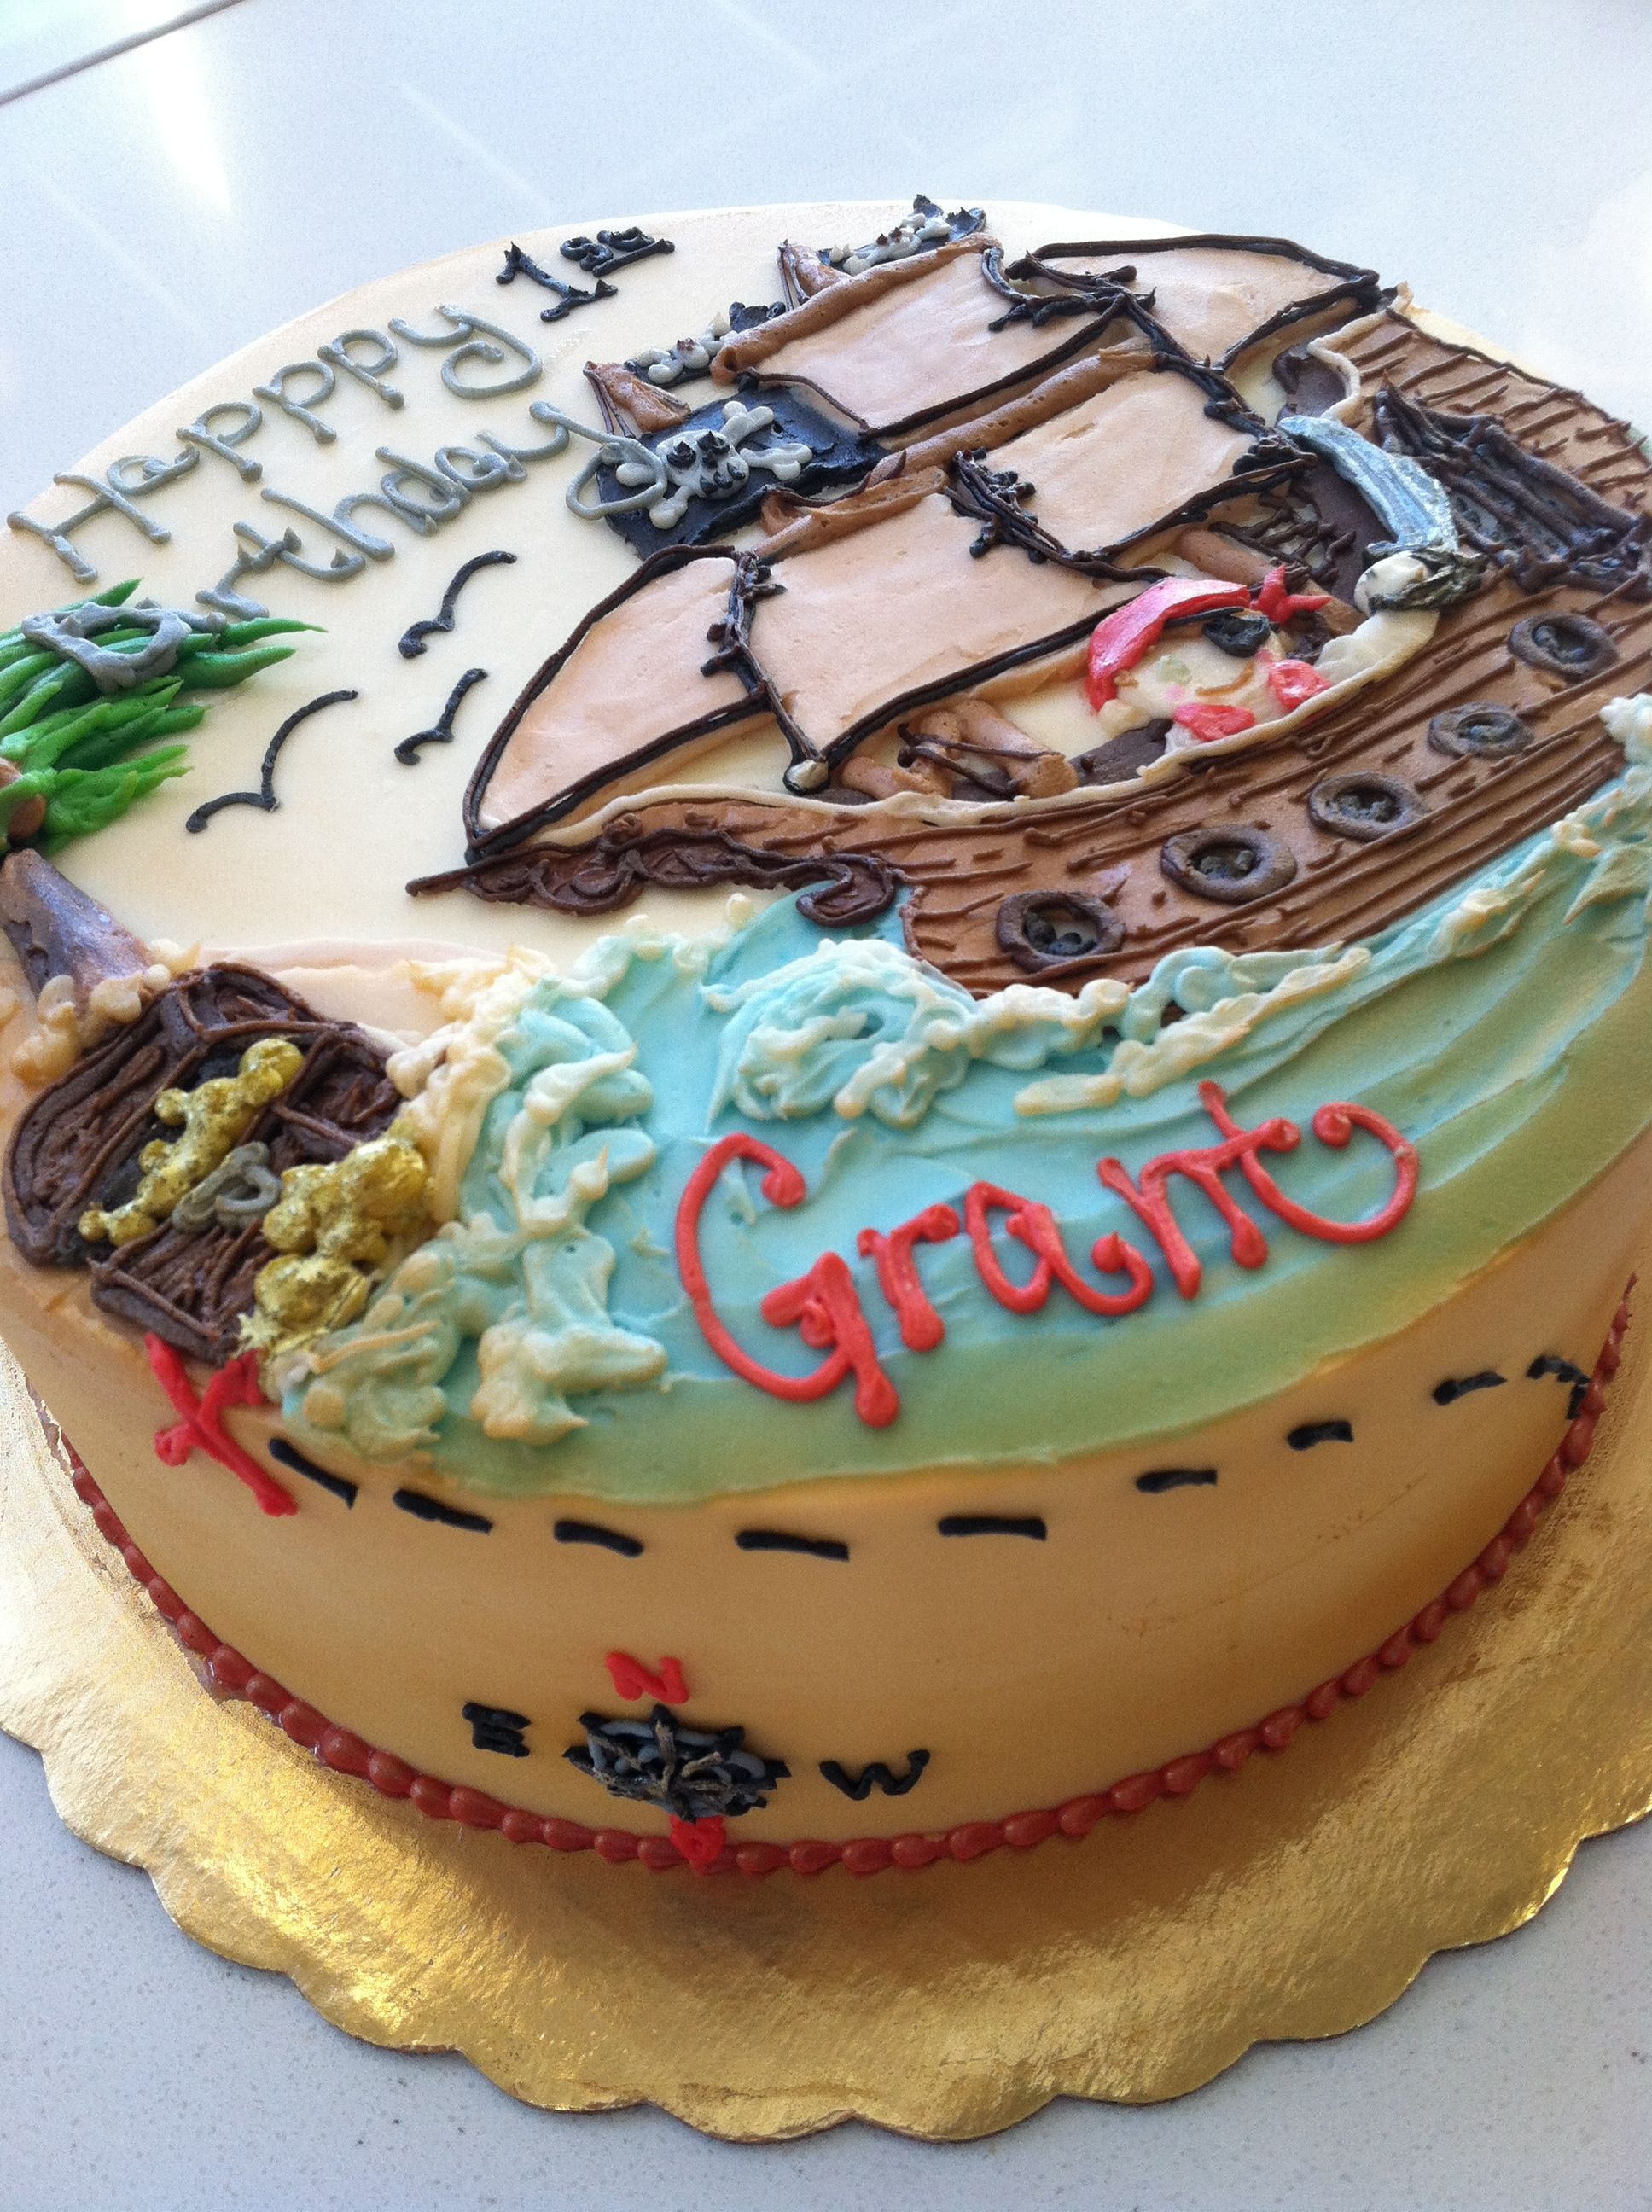 Buttercream Pirate Themed Birthday Cake